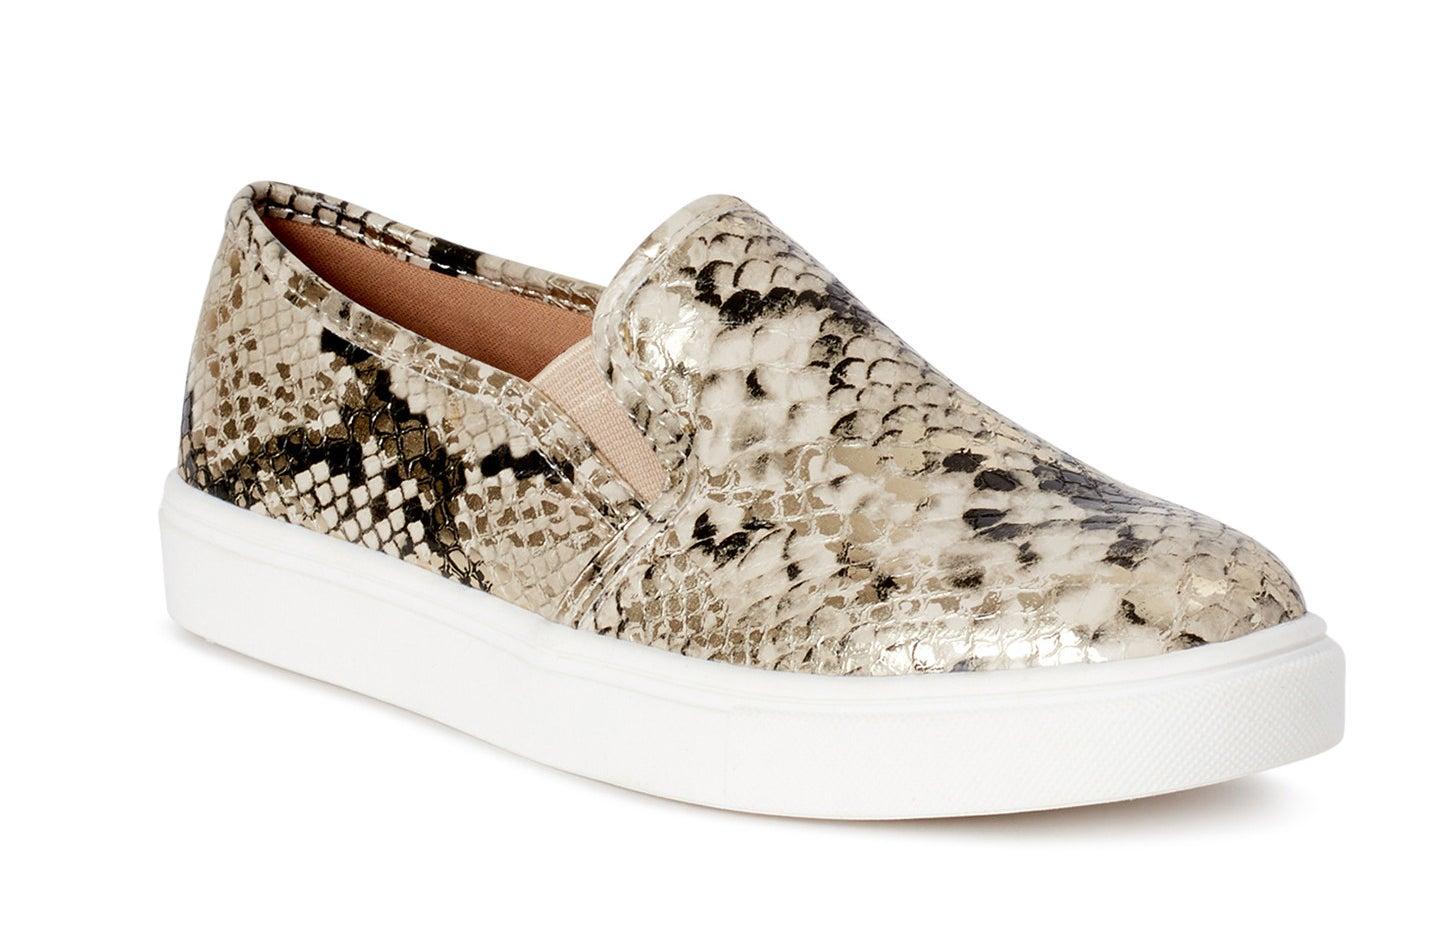 Snakeskin slip on sneakers